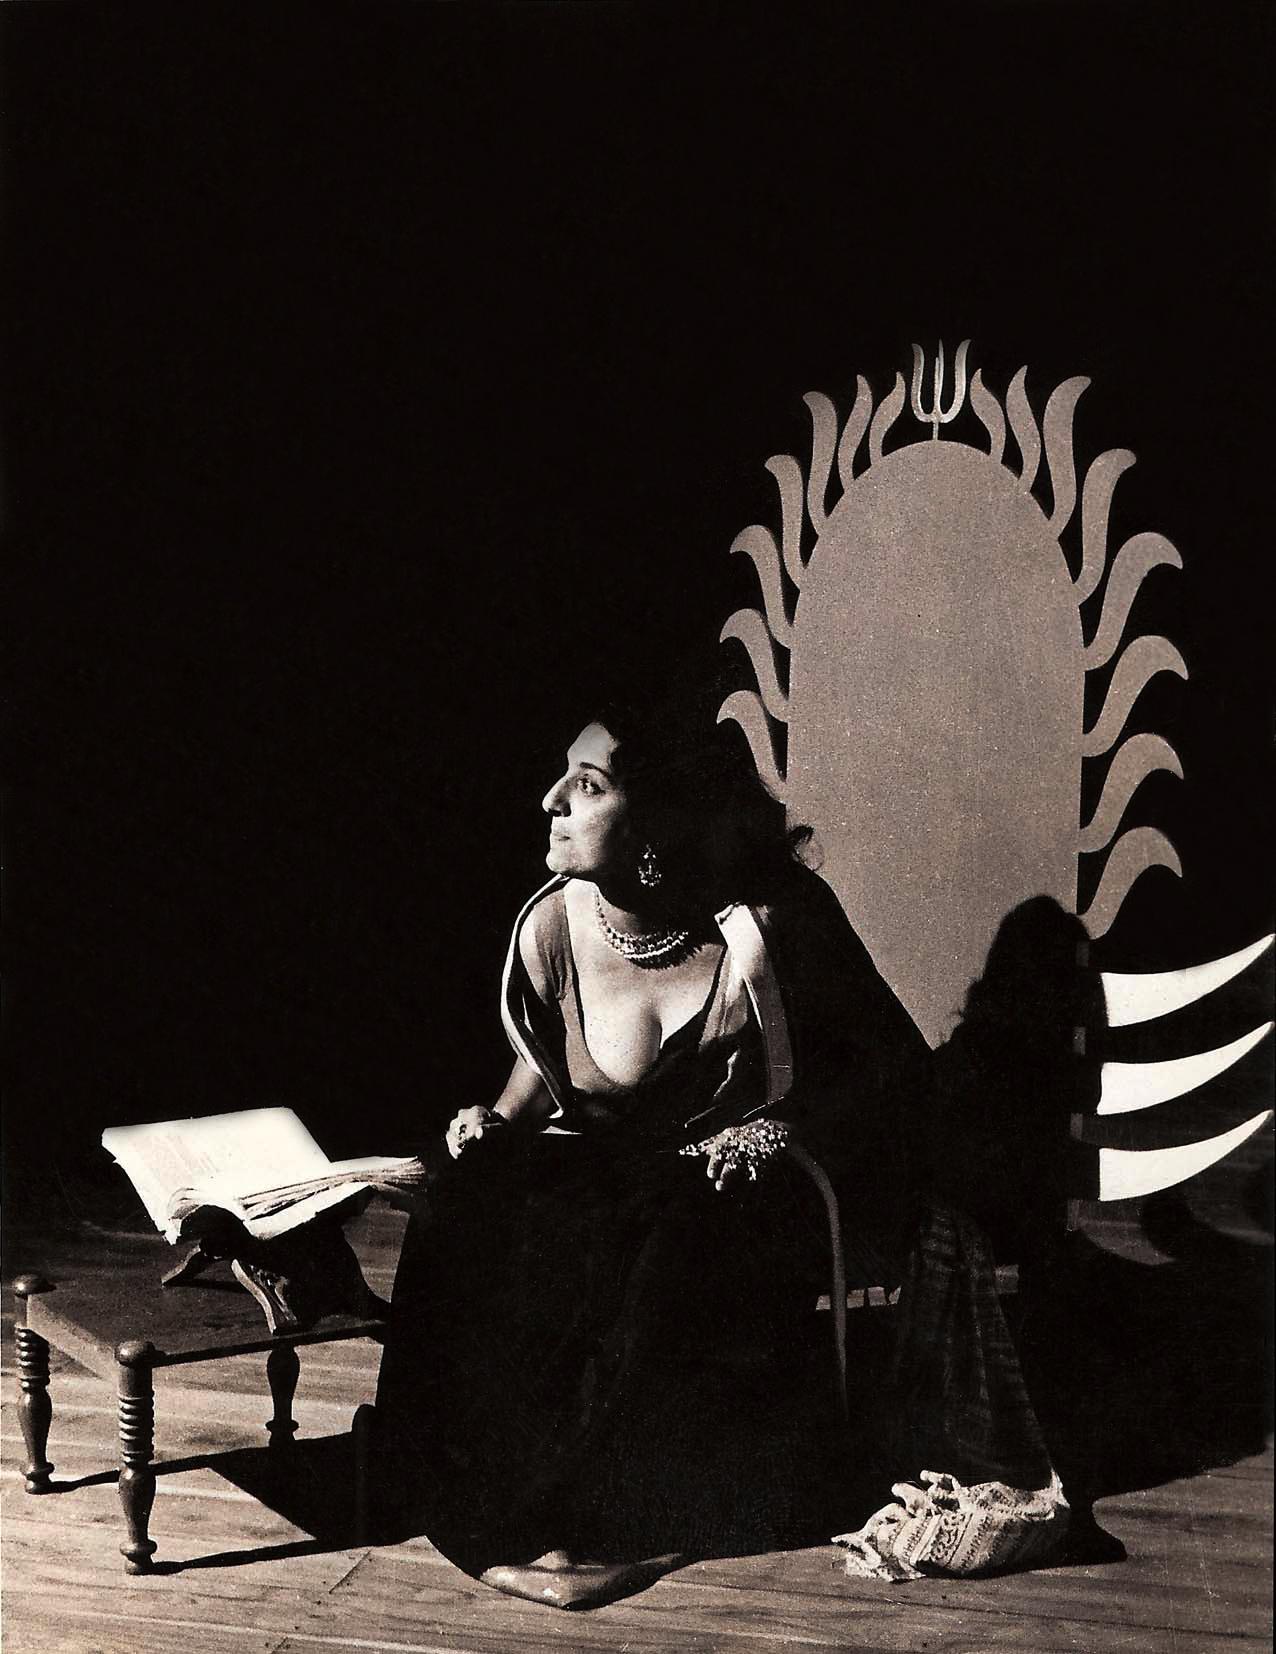 JV as Ravana- New York 1973